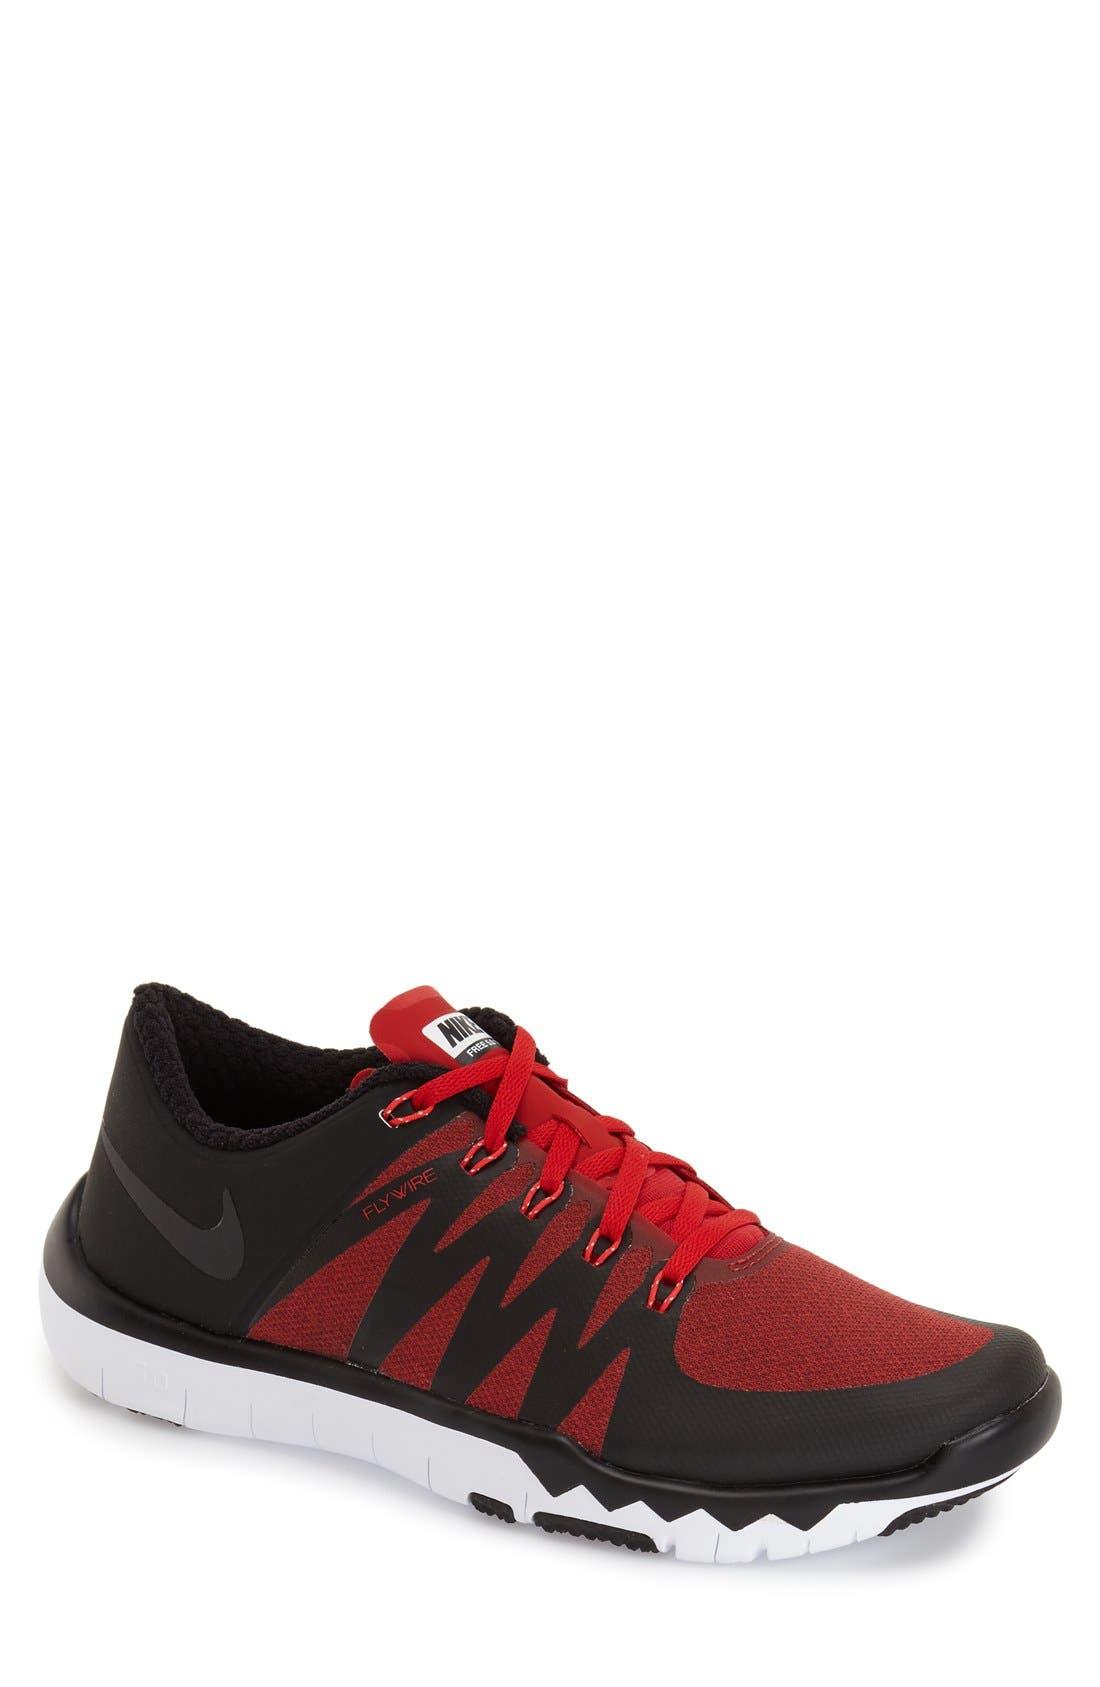 sale retailer a9743 11730 ... australia main image nike free trainer 5.0 training shoe . 0e8ea e6a2a